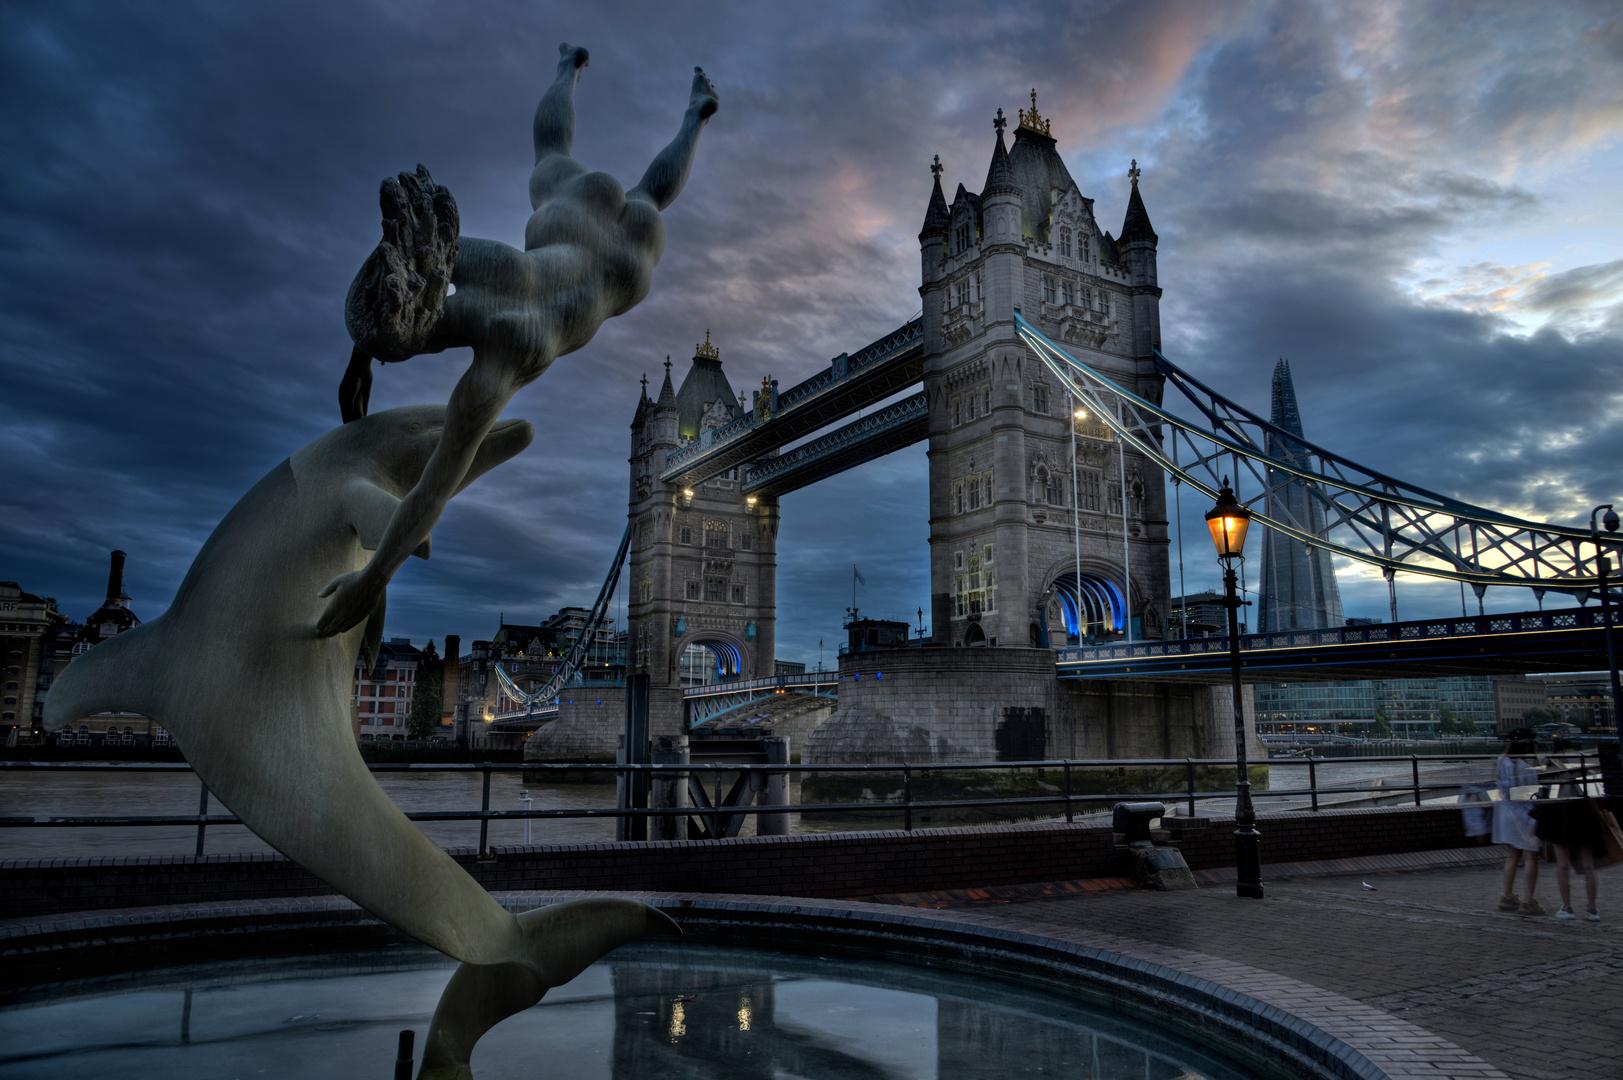 London Tower Bridge 2